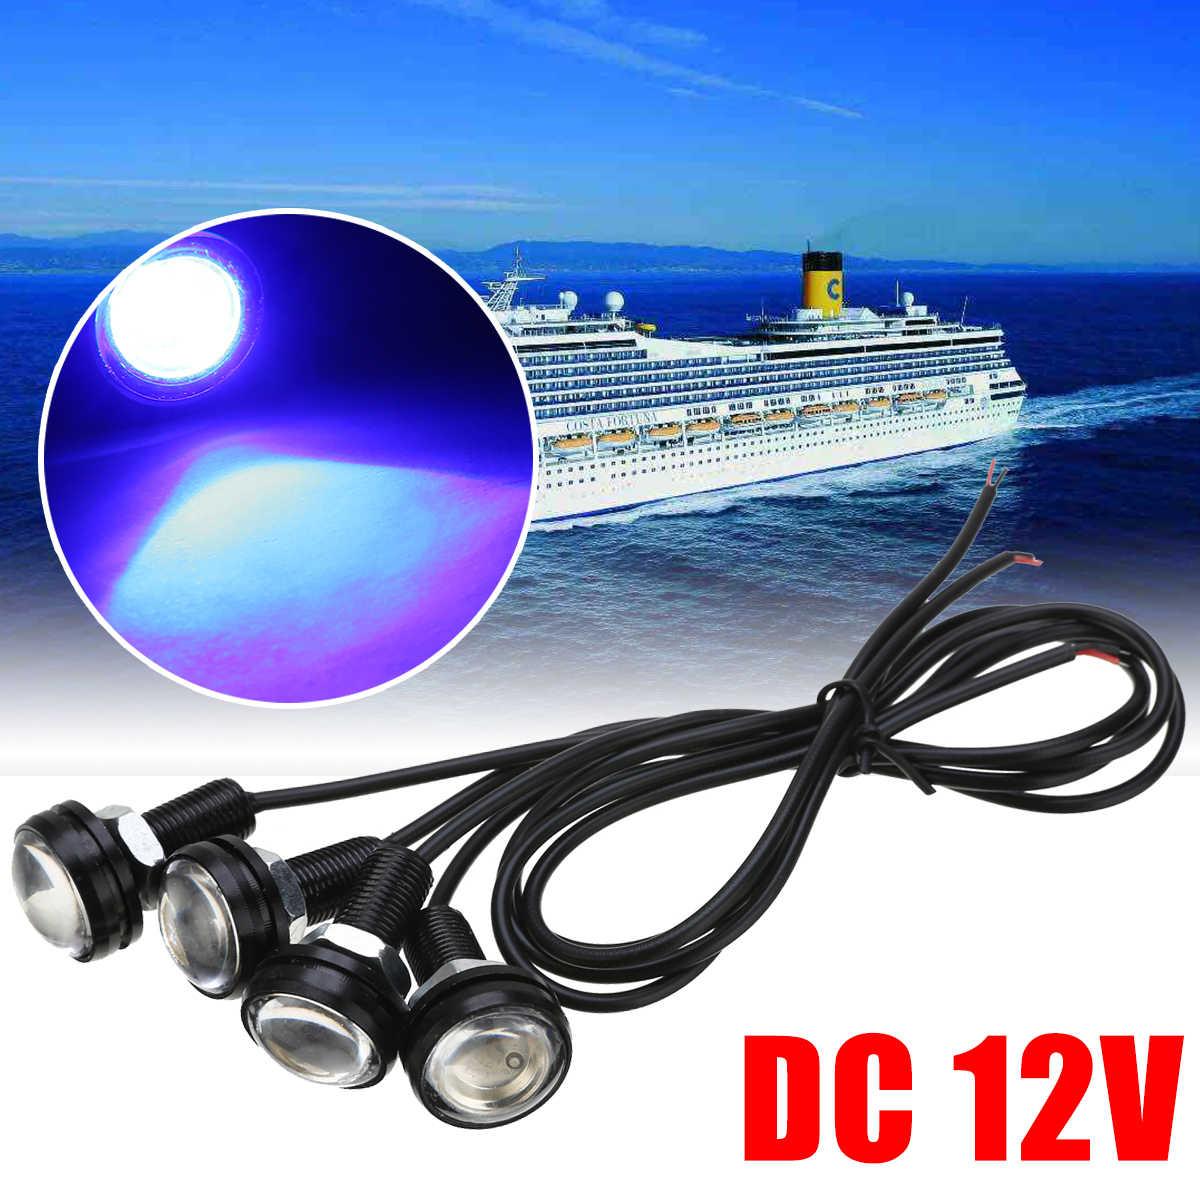 4x Blue LED Boat Light Waterproof Outrigger Spreader Transom Underwater  Light